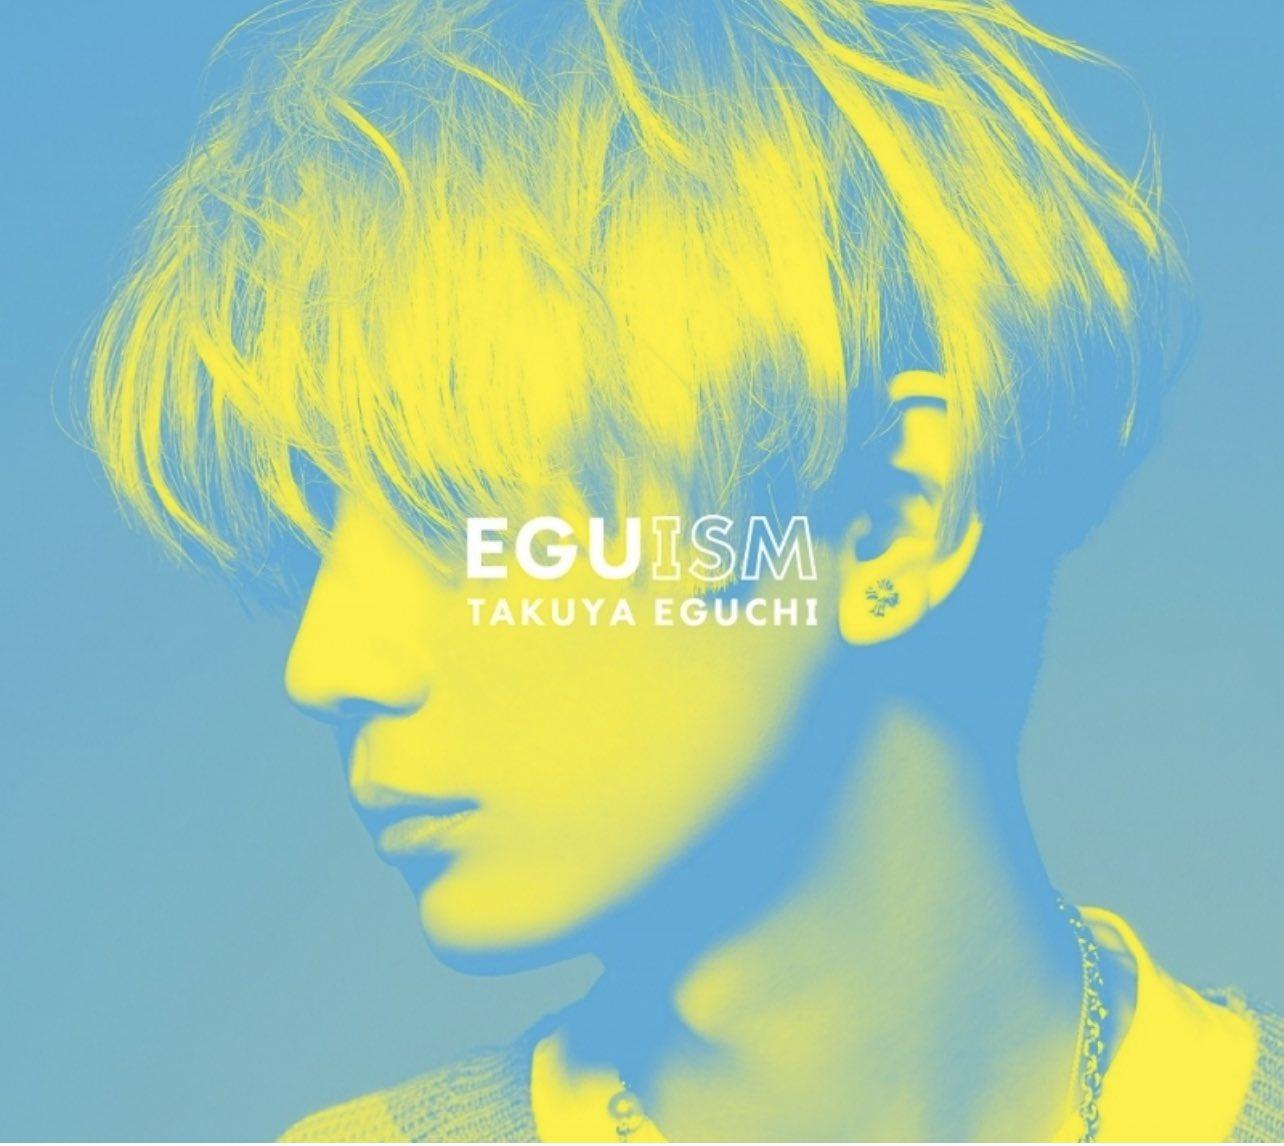 江口拓也 - EGUISM